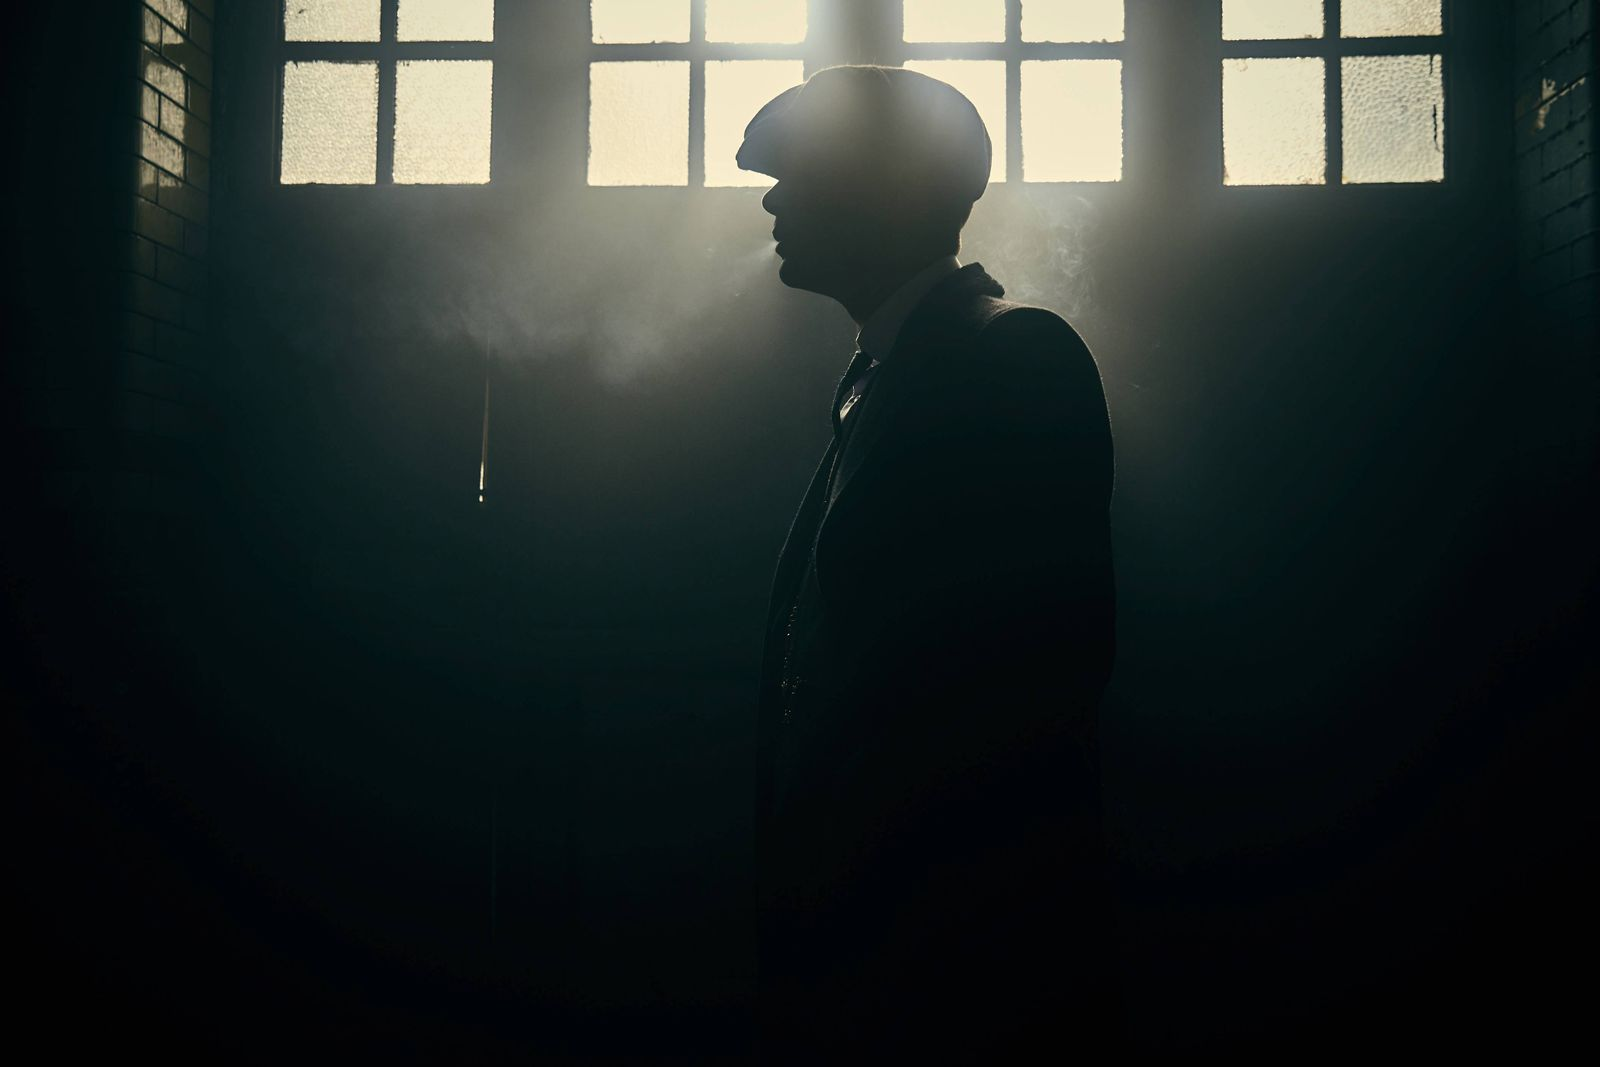 Cillian Murphy Peaky Blinders Season 4 2018 Netflix Los Angeles CA PUBLICATIONxINxGERxSUIxAUTxONL